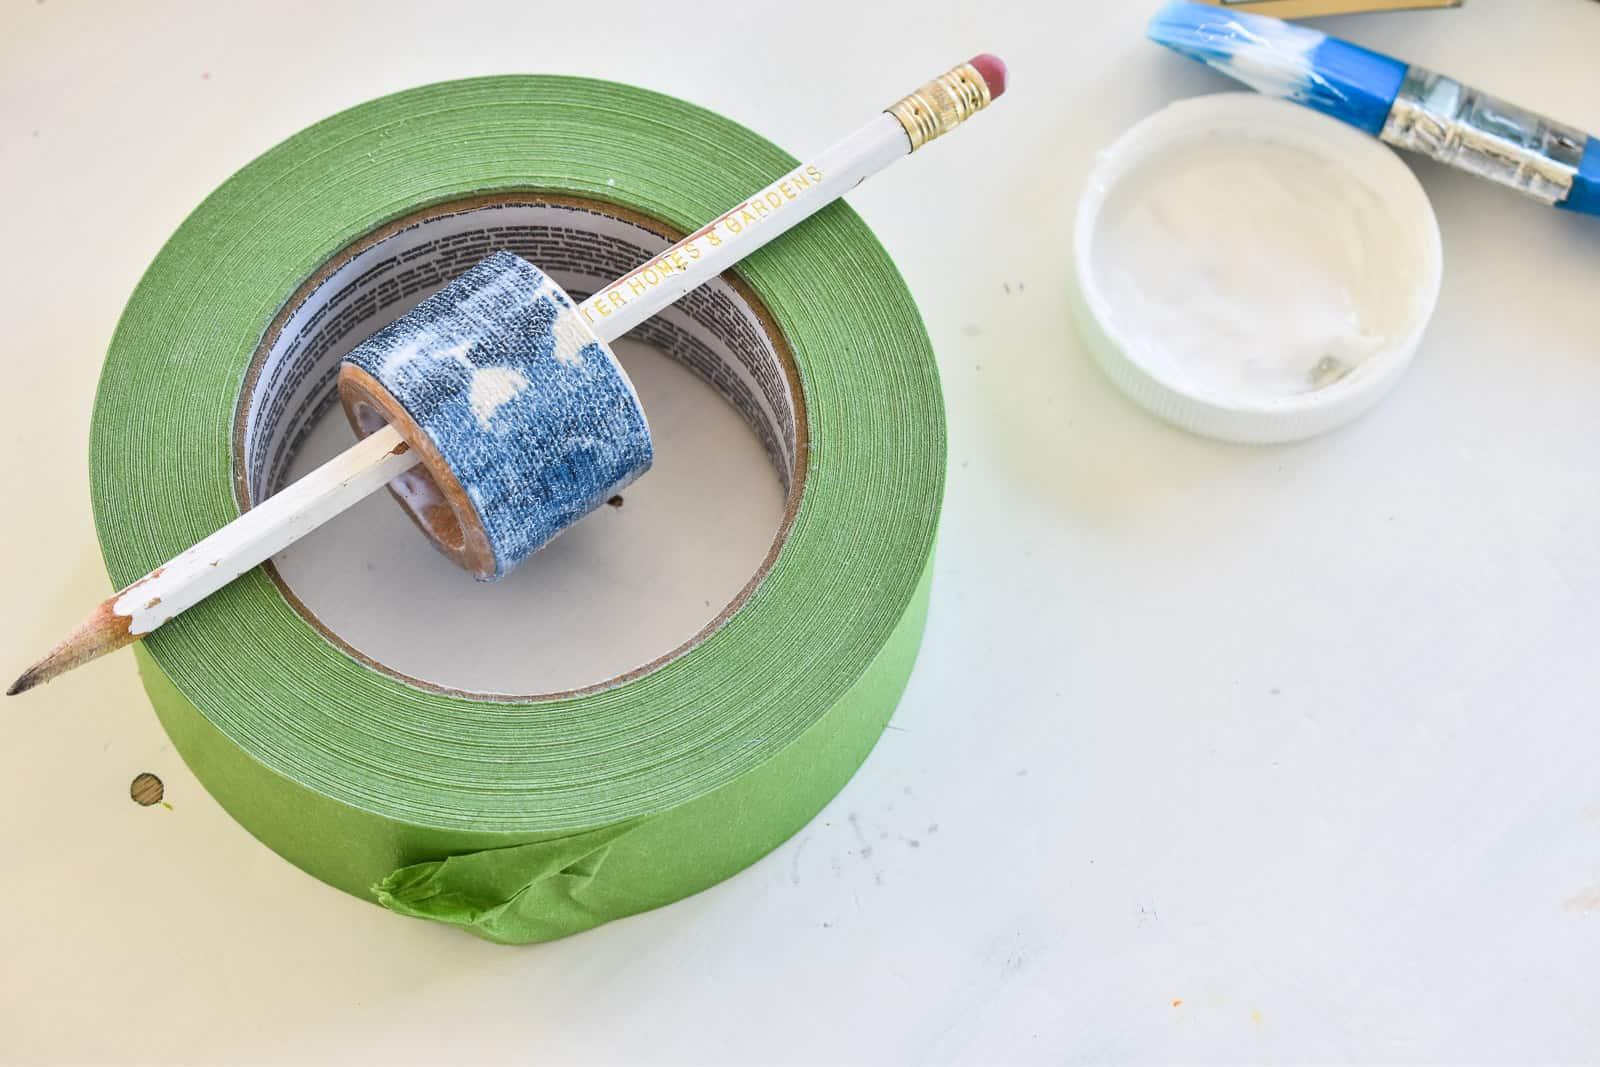 napkin ring drying in frog tape